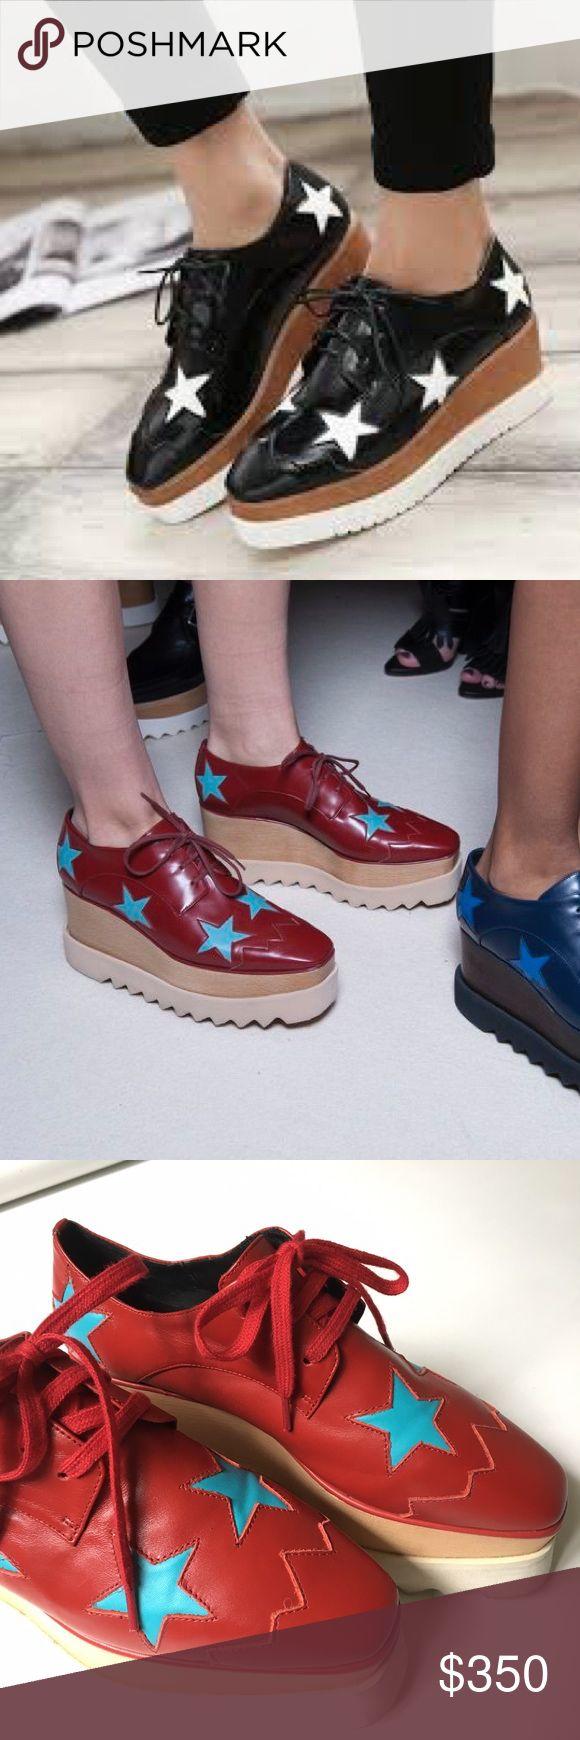 Stella McCartney platform oxford Red shoe wig blue stars by Stella  maccartney Stella McCartney Shoes Platforms